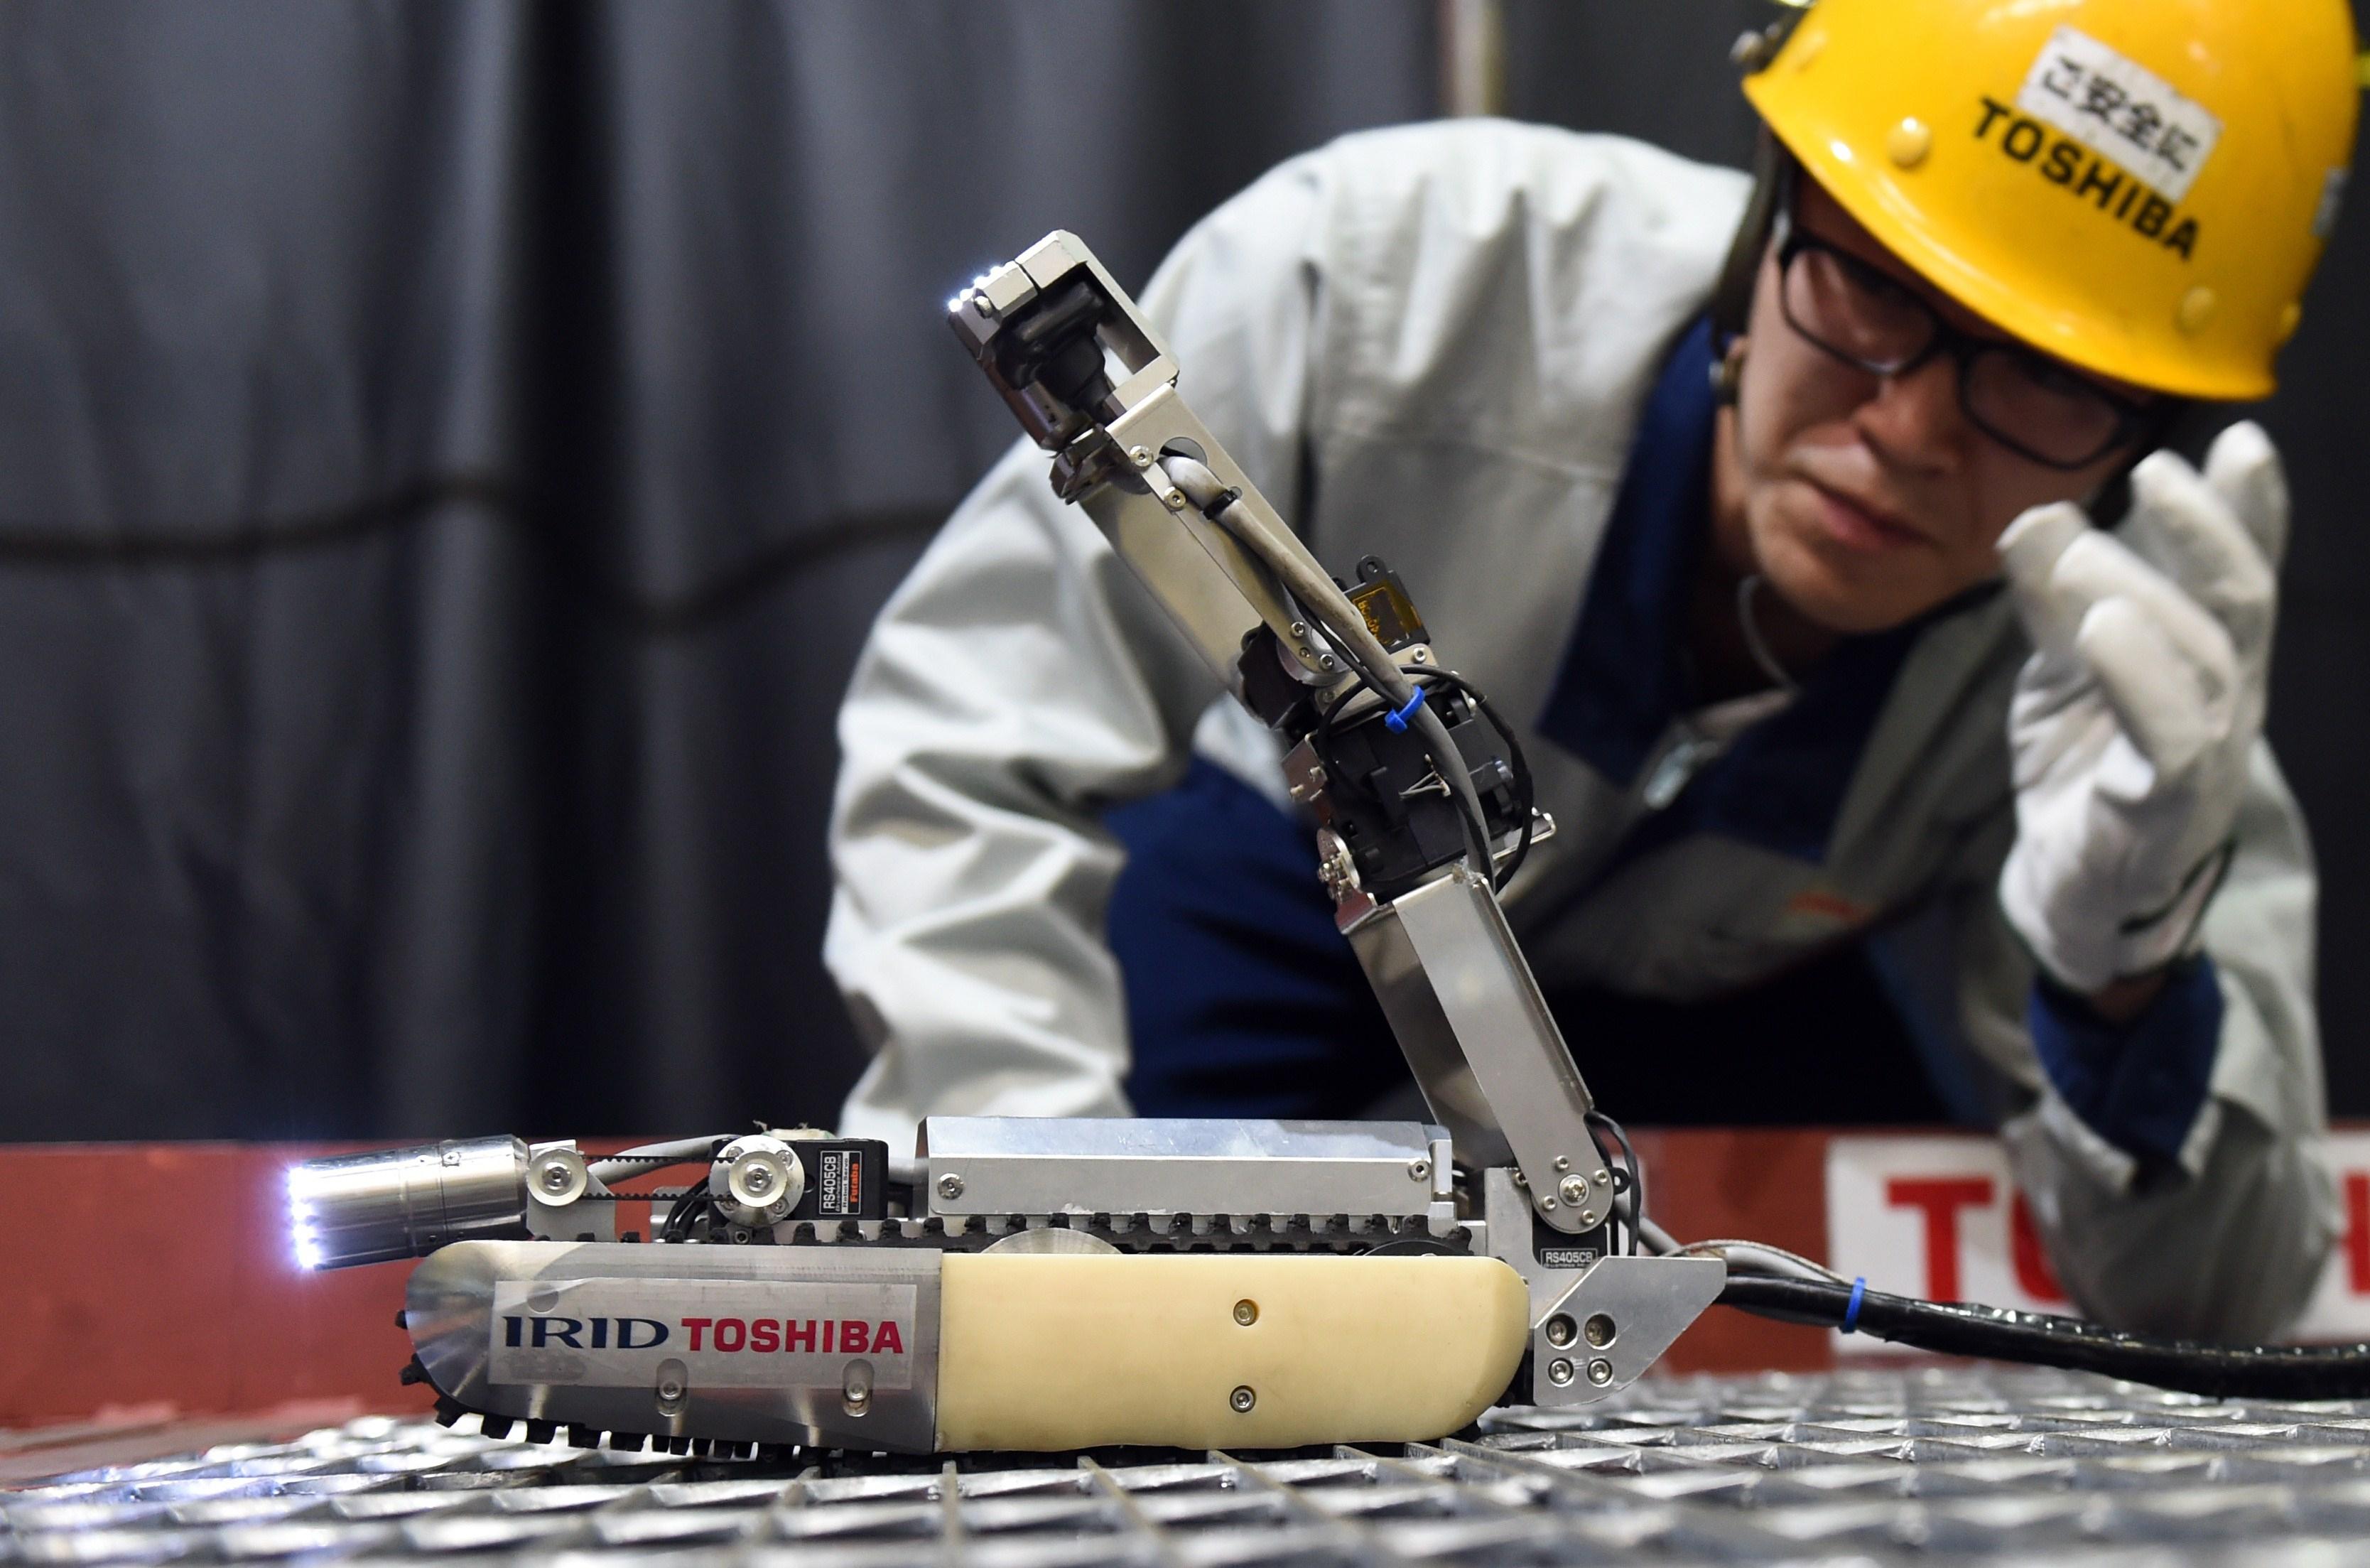 JAPAN-DISASTER-NUCLEAR-ROBOT-TOSHIBA